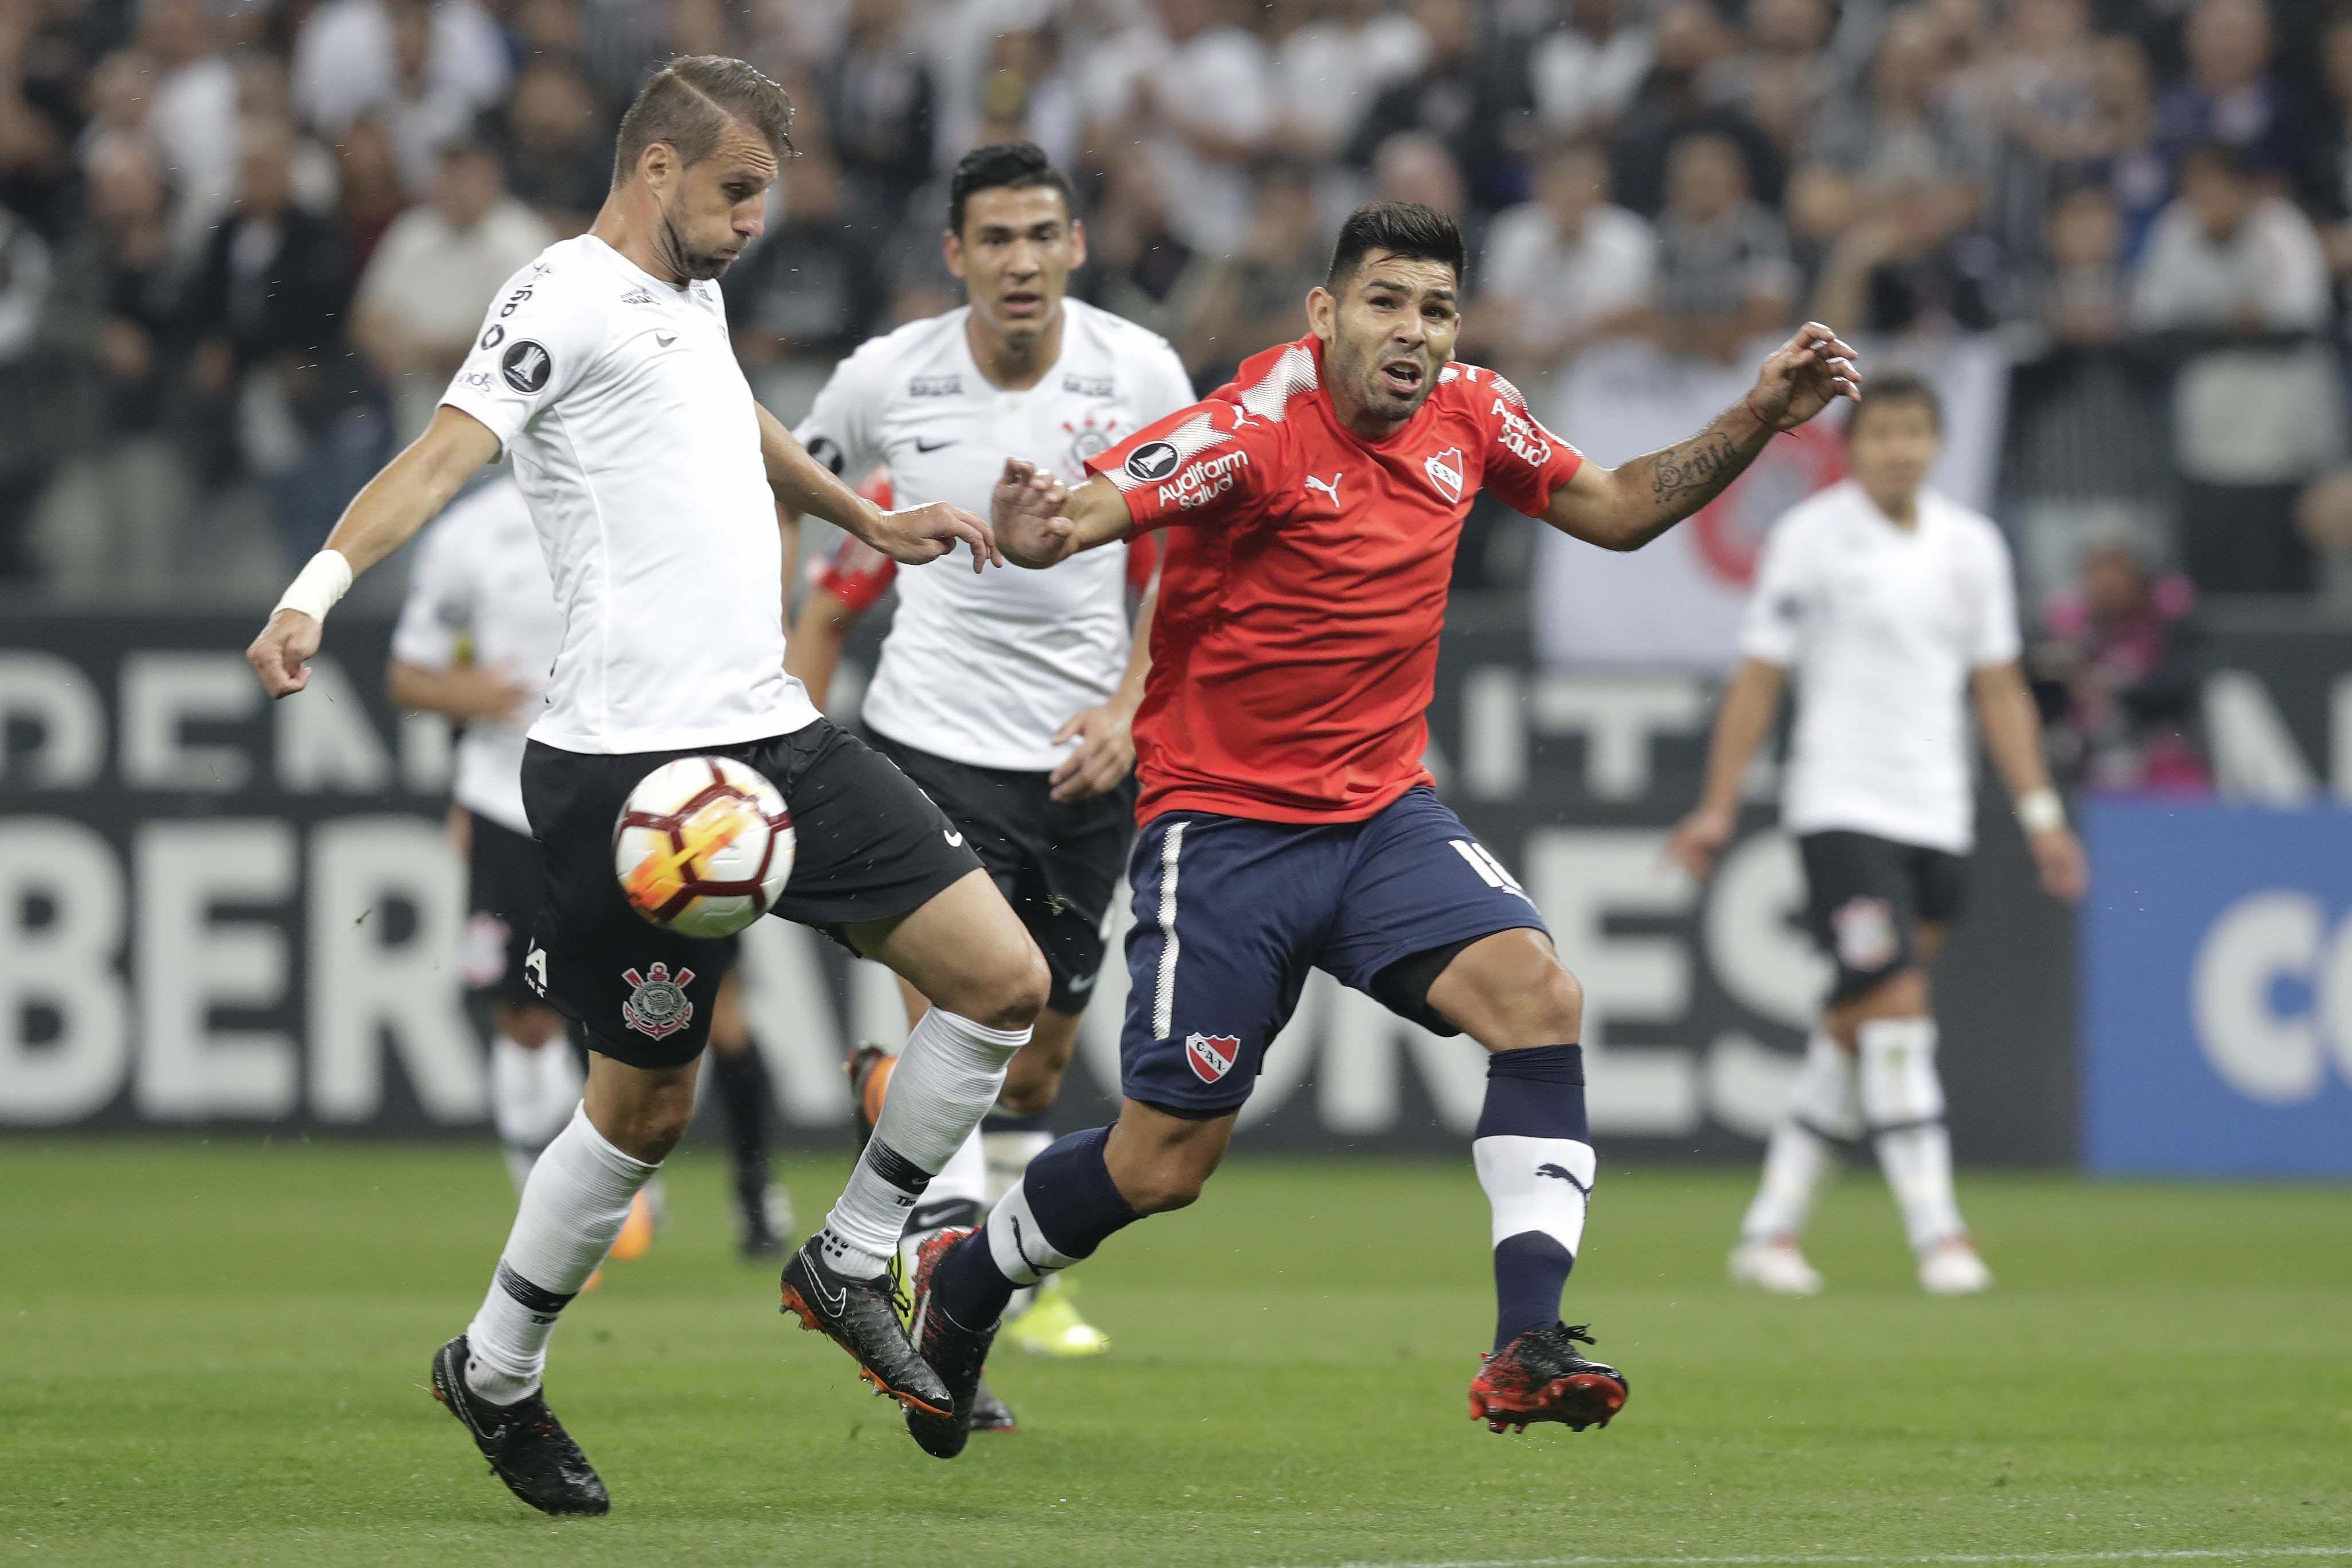 Silvio Romero no marcó pero complicó a toda la defensa de Corinthians